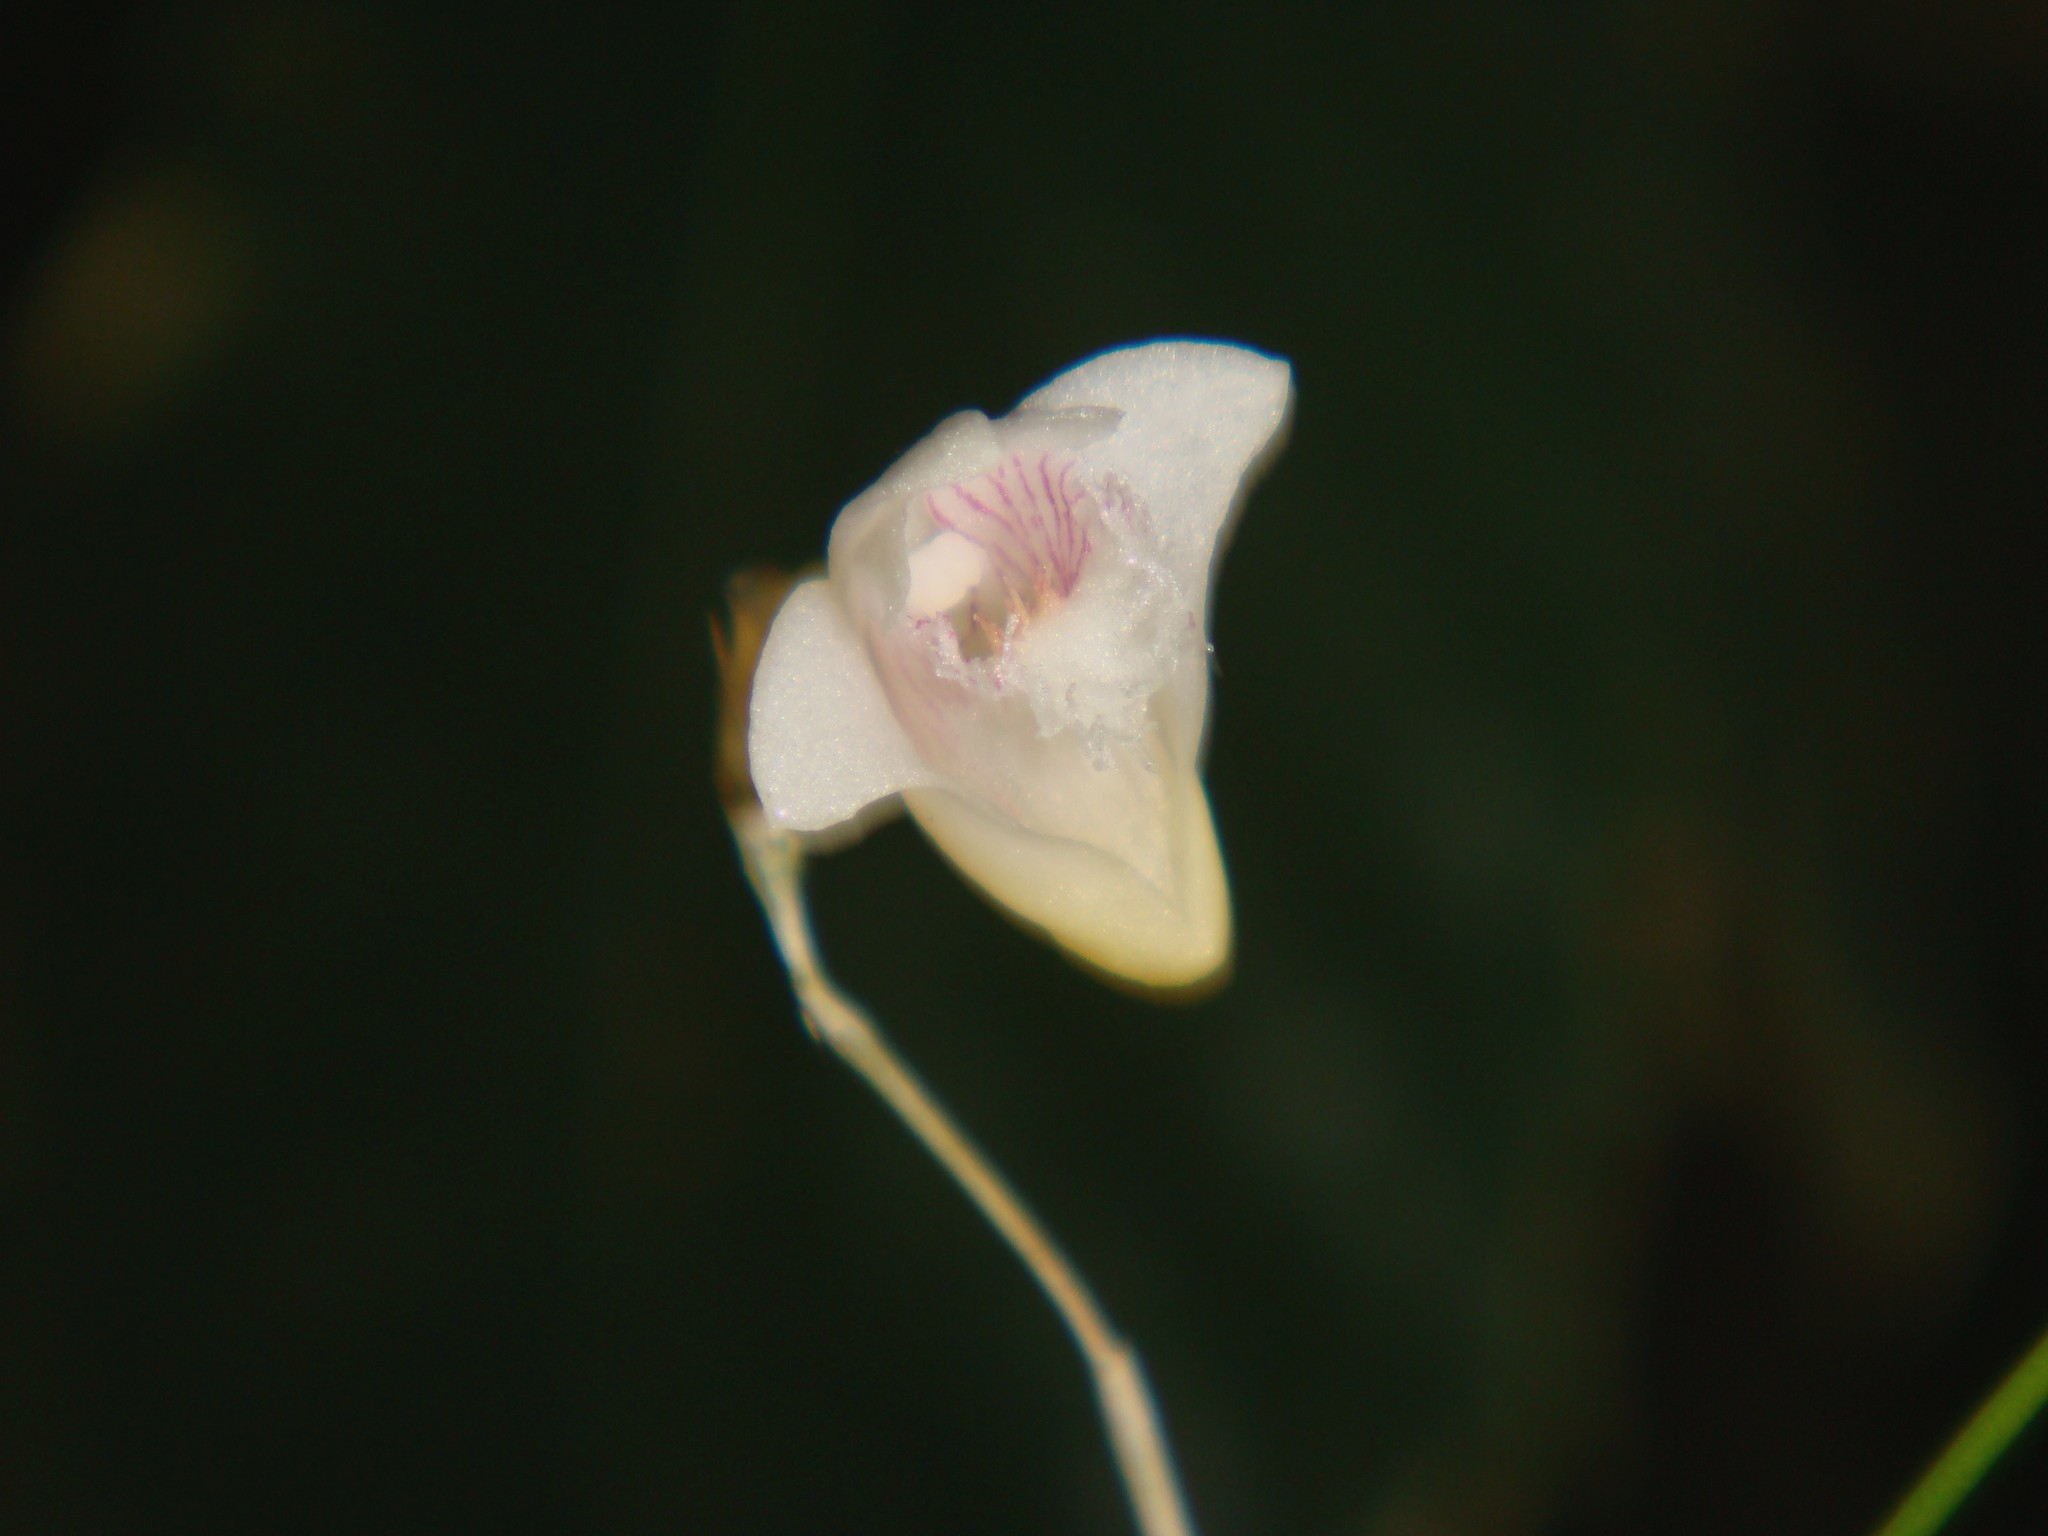 http://orchids.la.coocan.jp/Dendrobium/Dendrobium%20setifolium/DSC00995.JPG